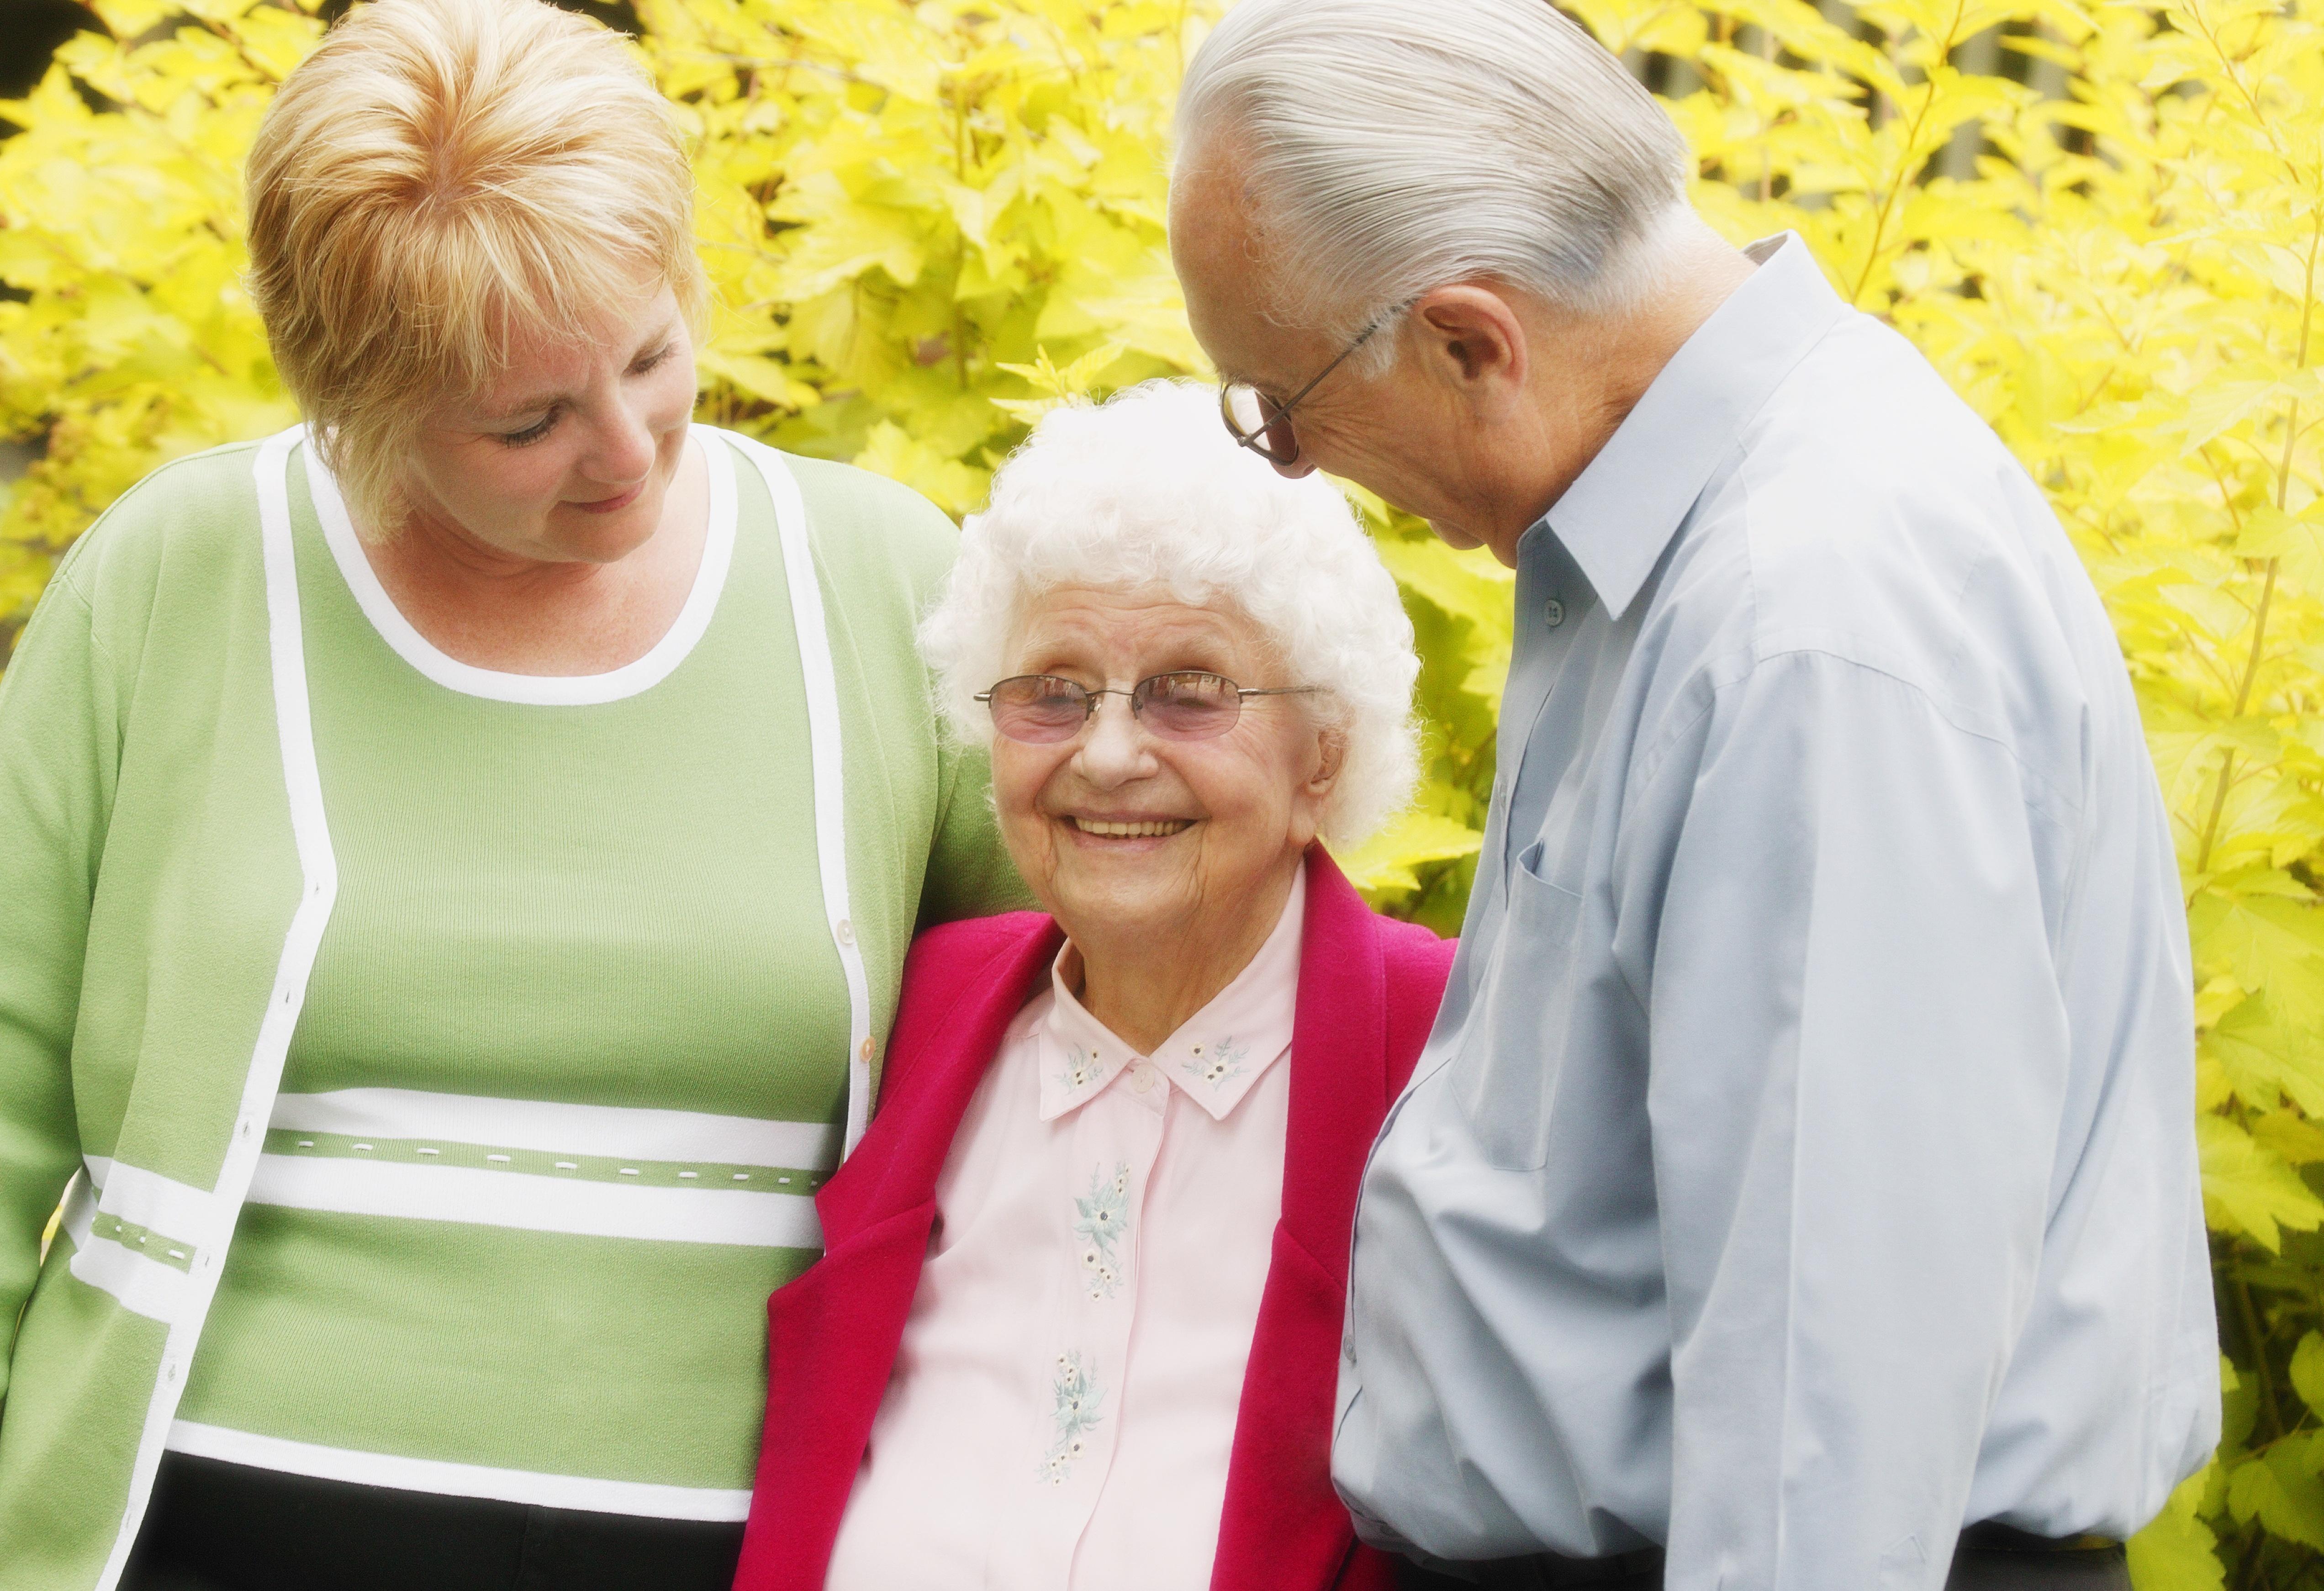 Become a Certified Elder Mediator